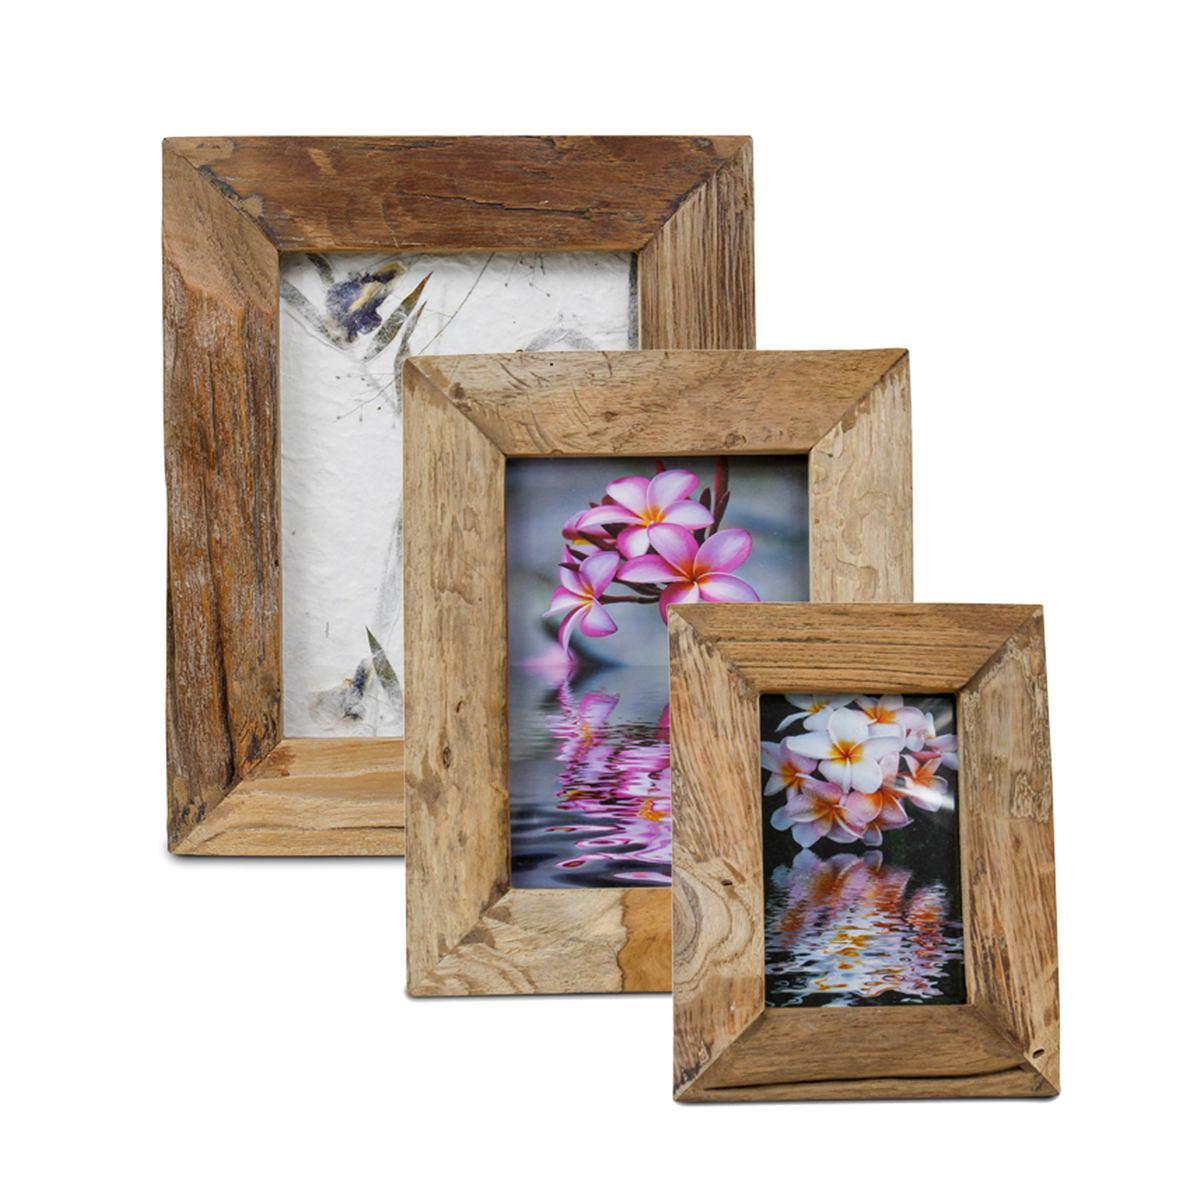 rustikaler bilderrahmen aus holz fotorahmen rahmen landhausstil thailand braun dekoration. Black Bedroom Furniture Sets. Home Design Ideas